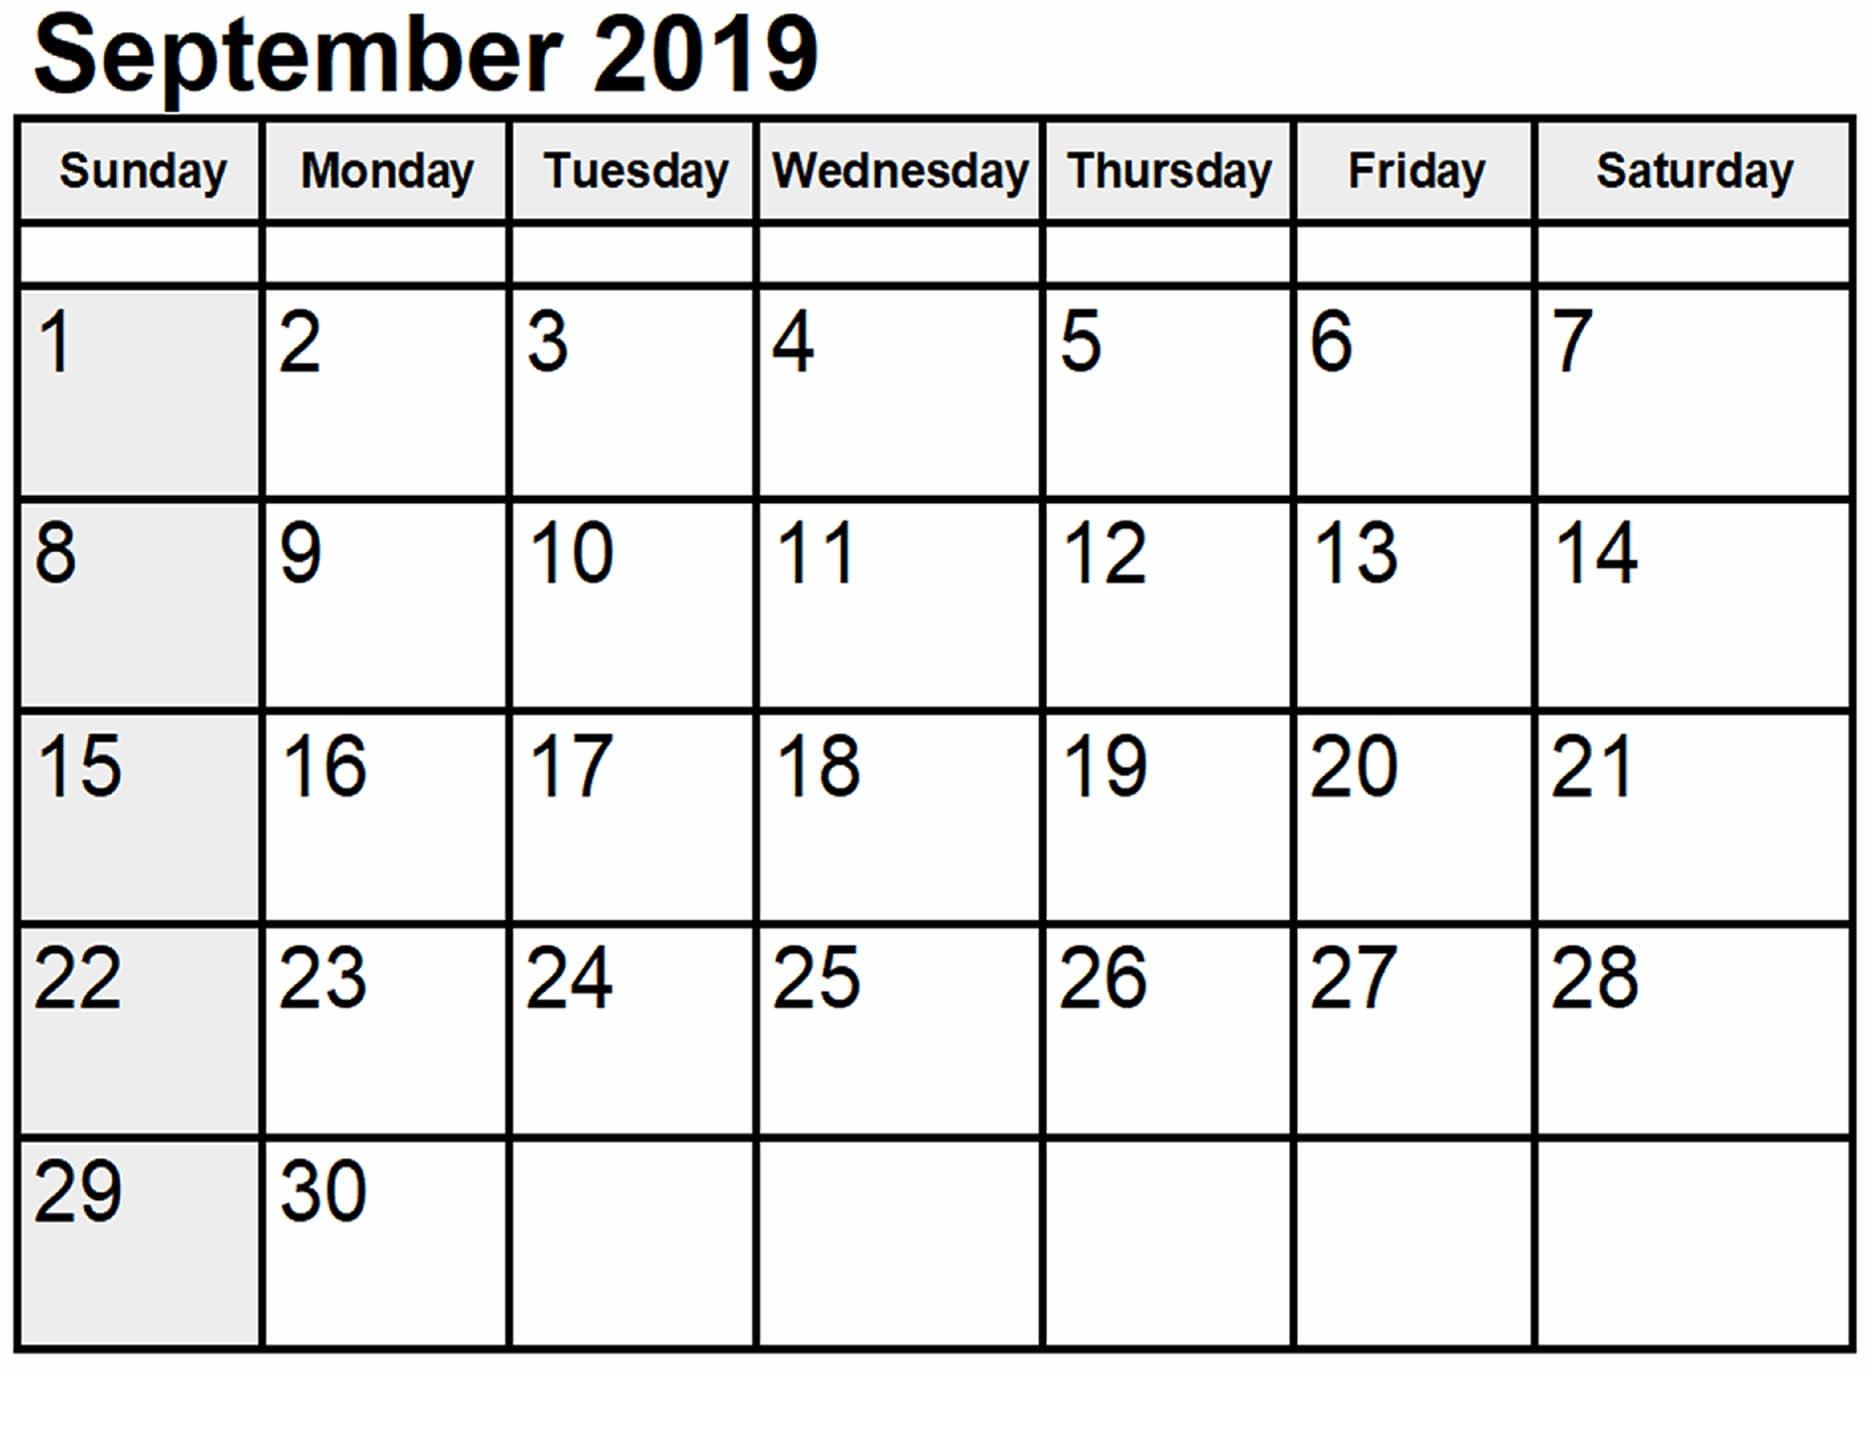 September 2019 Calendar Print Out